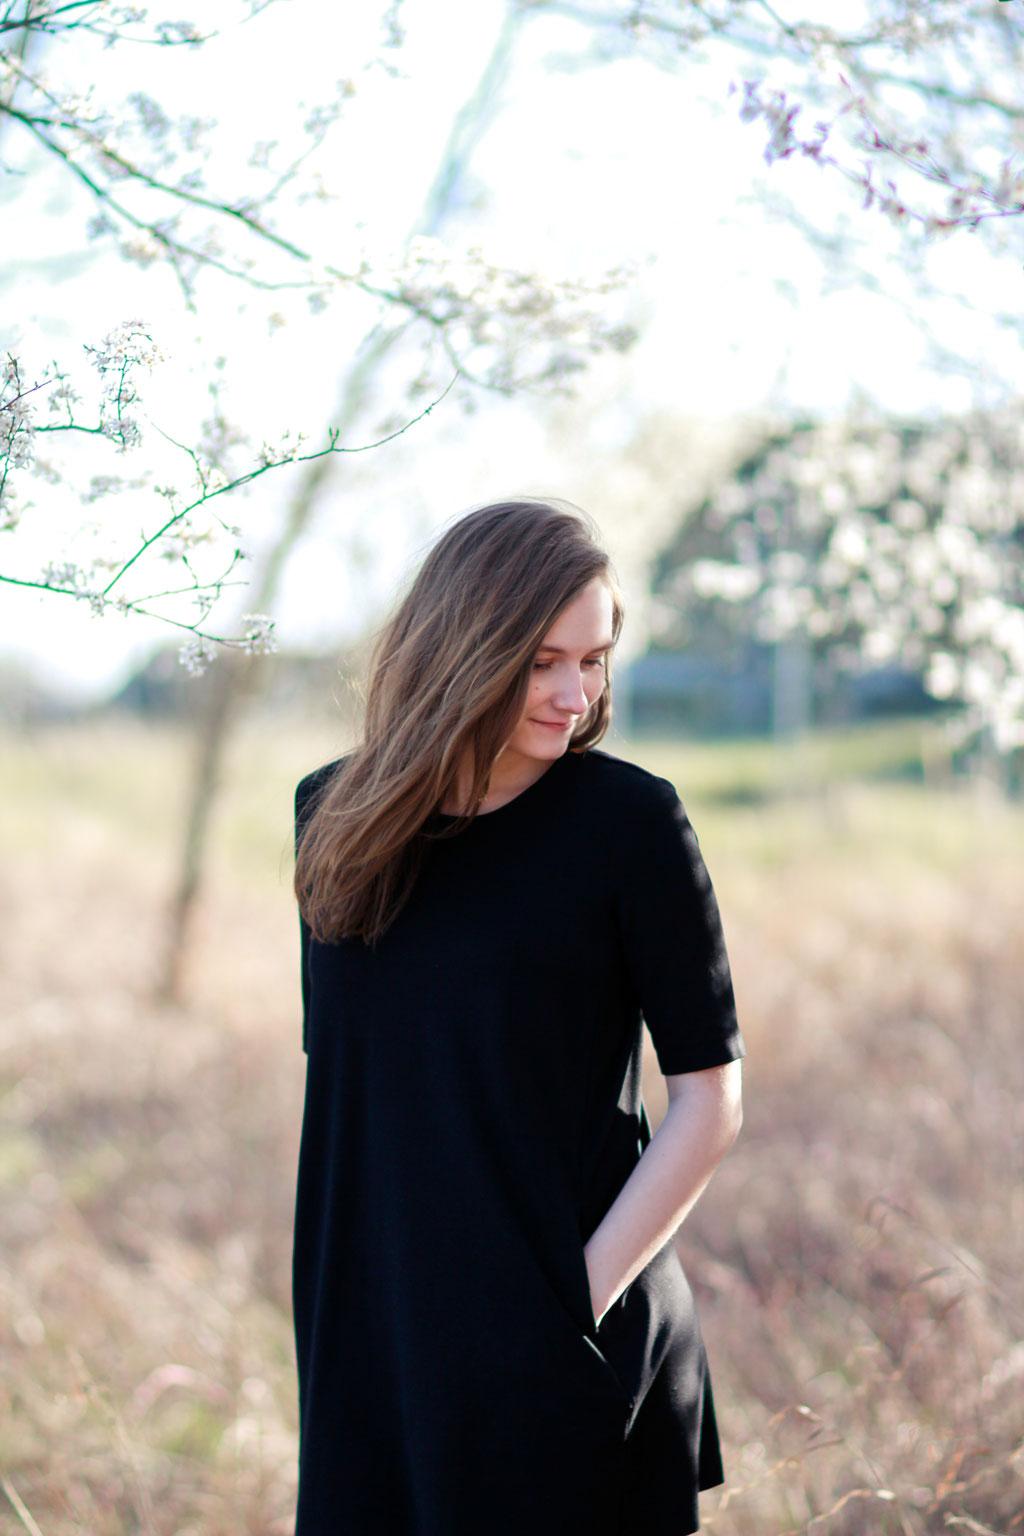 Portrait| Hendrikje Richert Fotografie| Gegenlicht| weiße Blüten| Freundinnenshooting